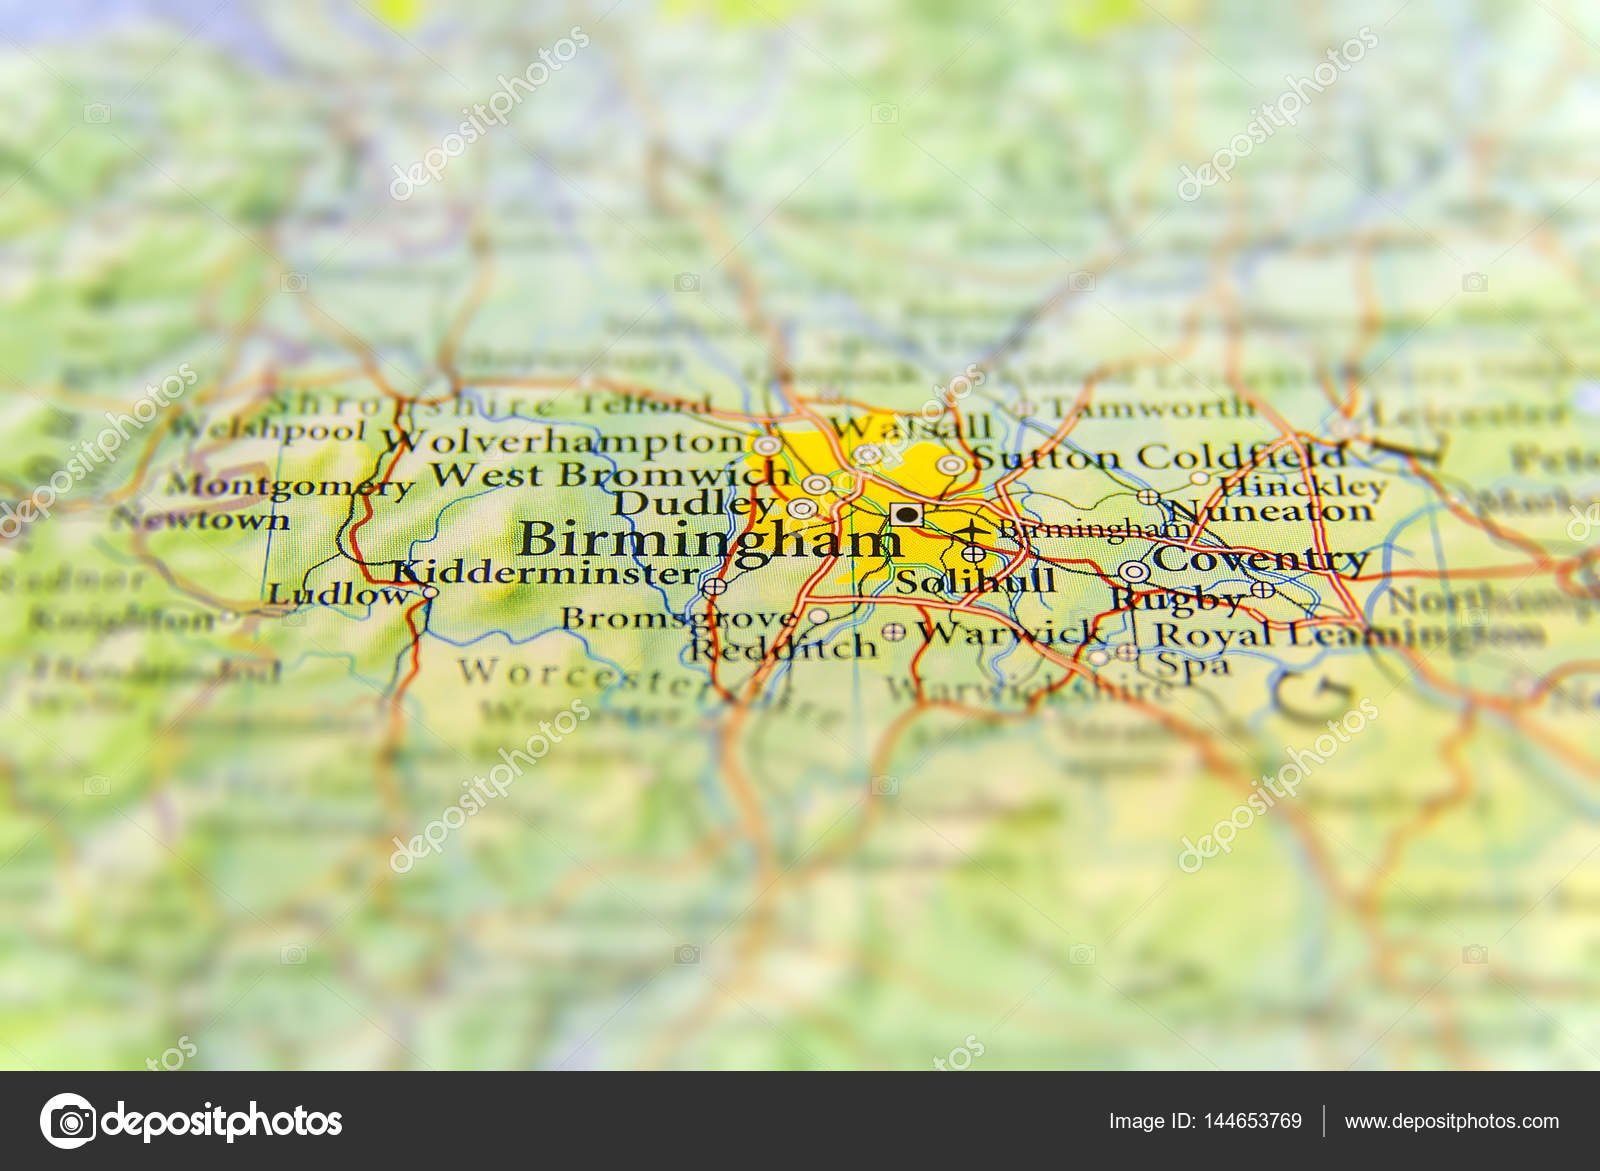 Map Of Uk Birmingham.Geographic Map Of European Country Uk With Birmingham City Stock